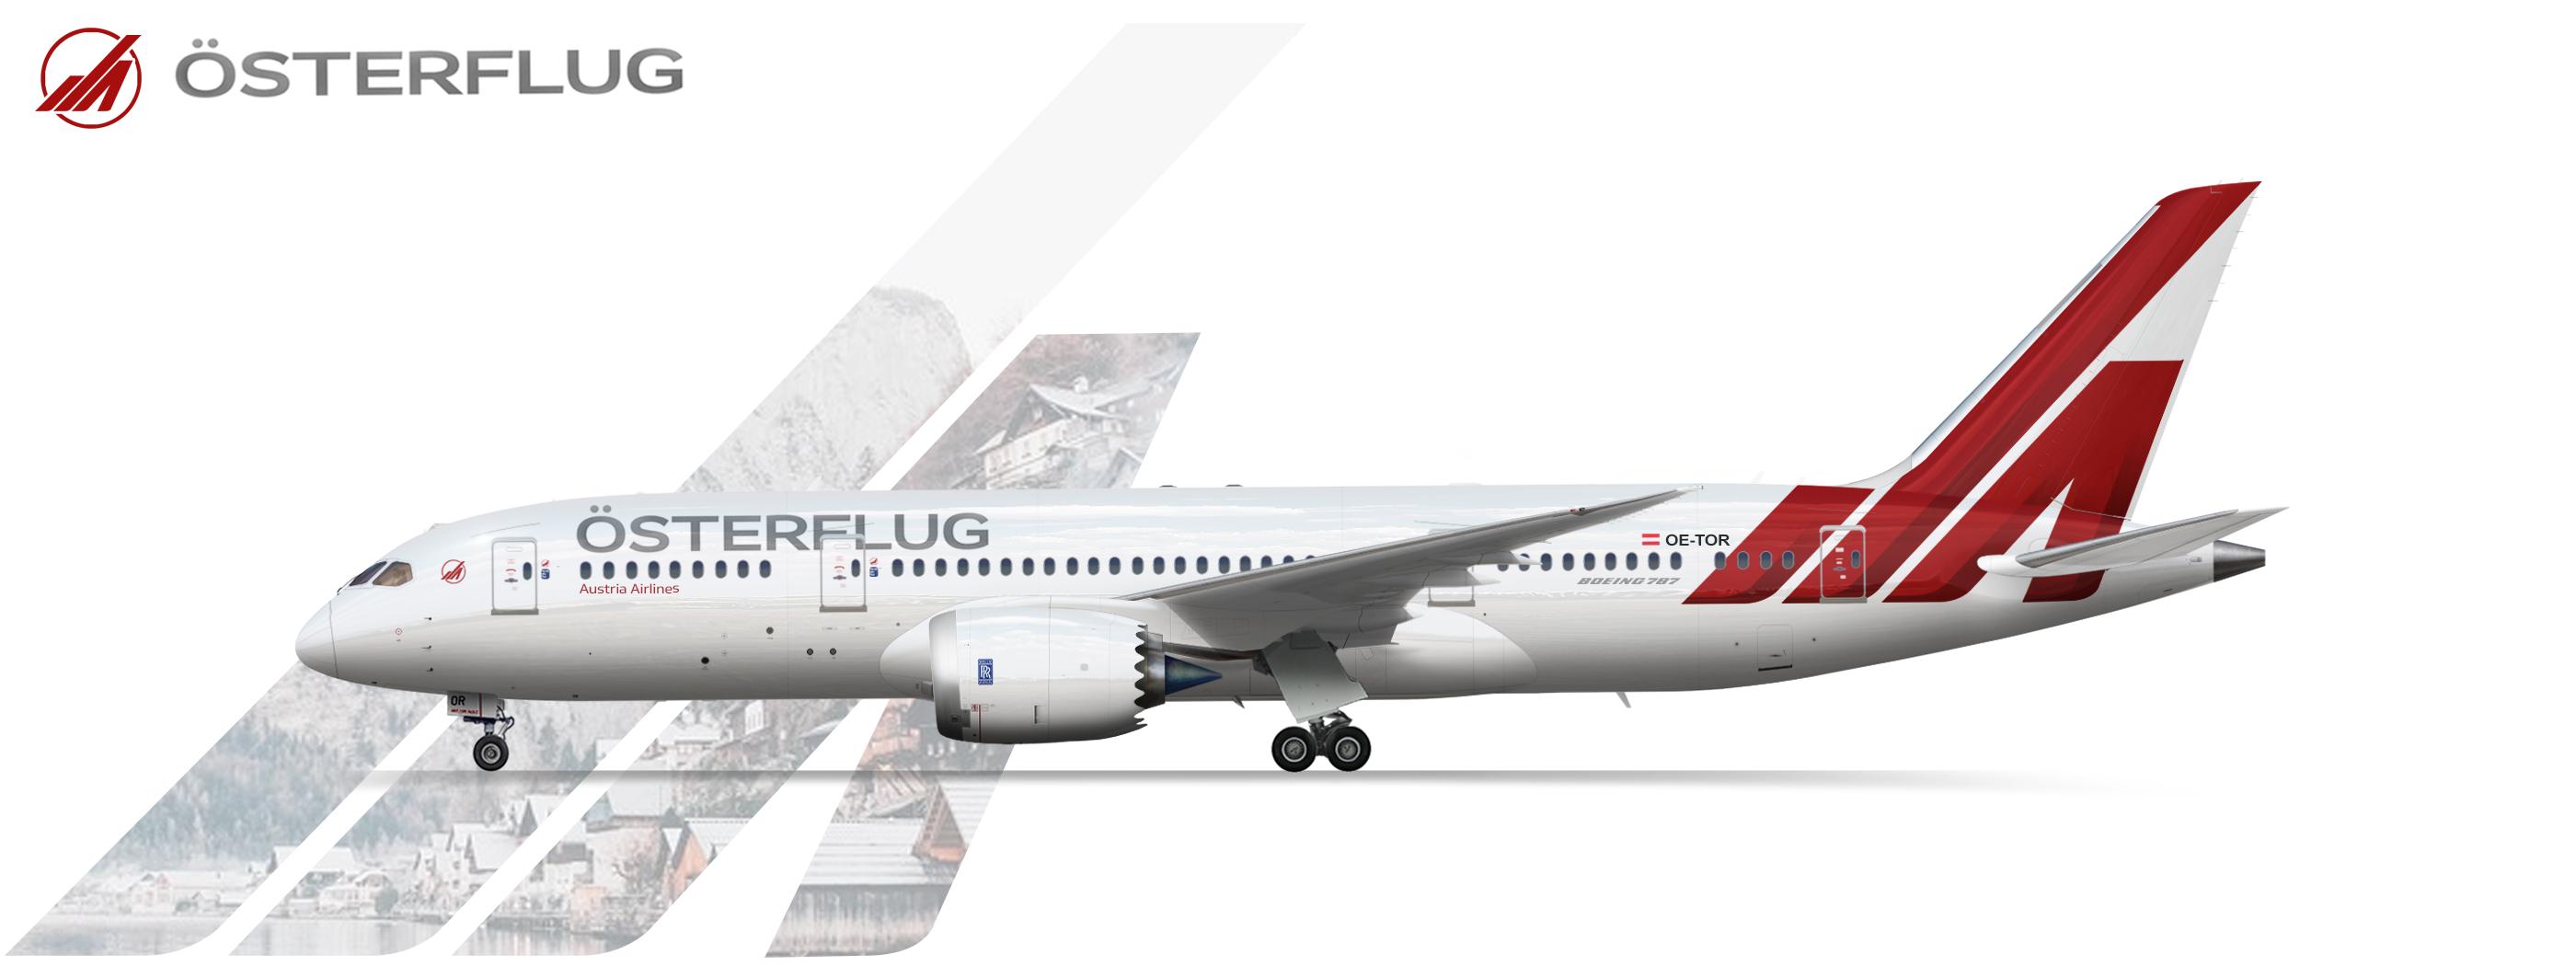 osterflug_788.png